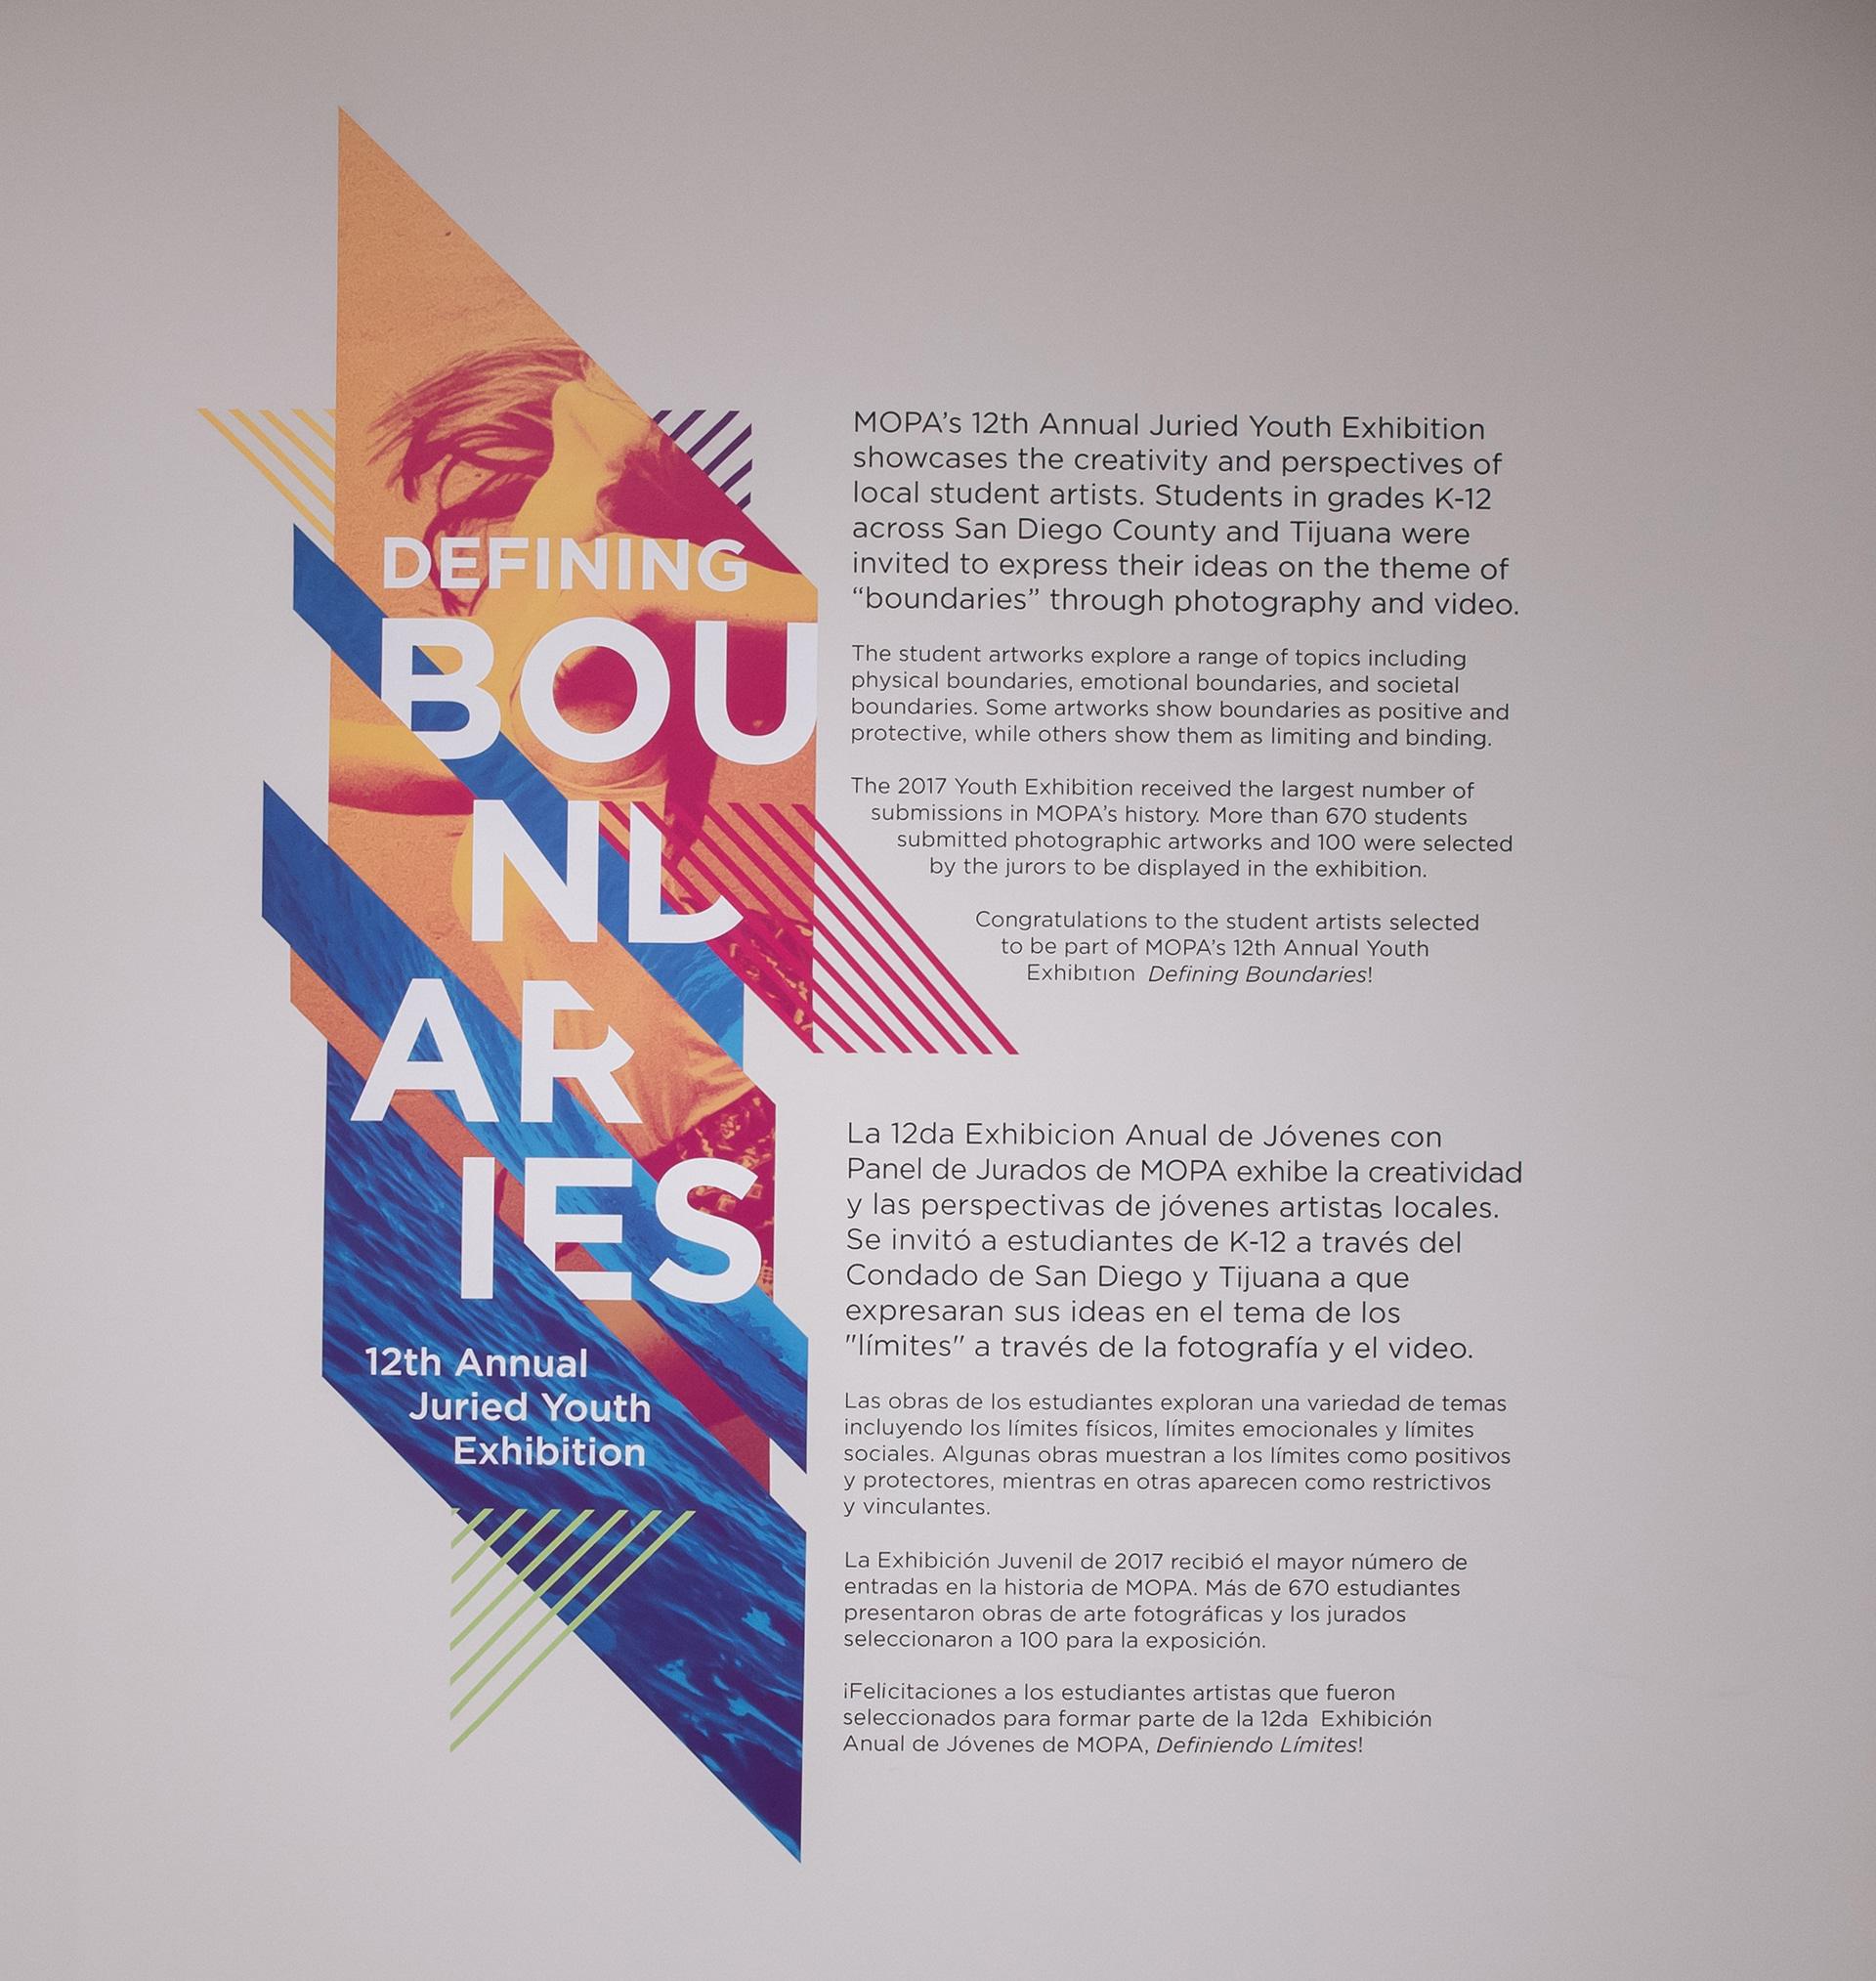 Jason Alfonso Museum Exhibition Branding Defining Boundaries